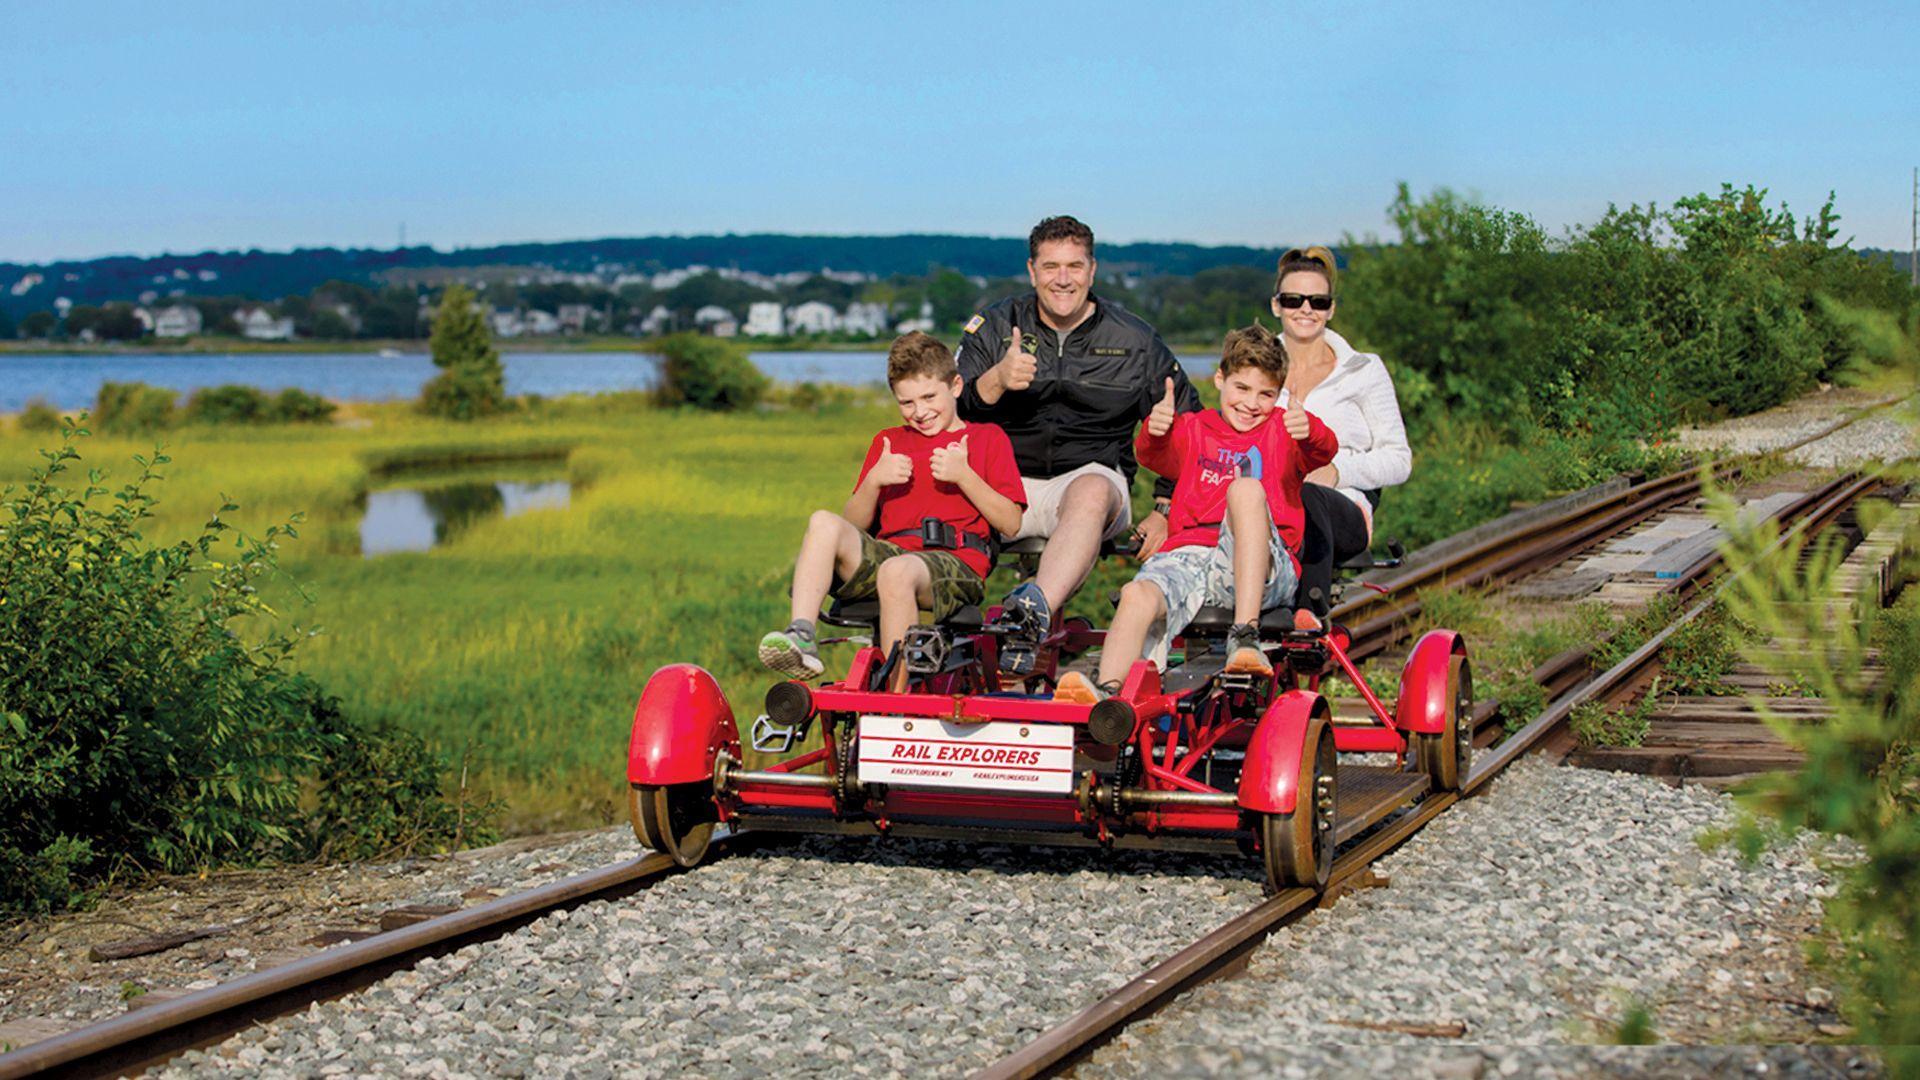 Northern Ramble Railbike ride in Rhode Island